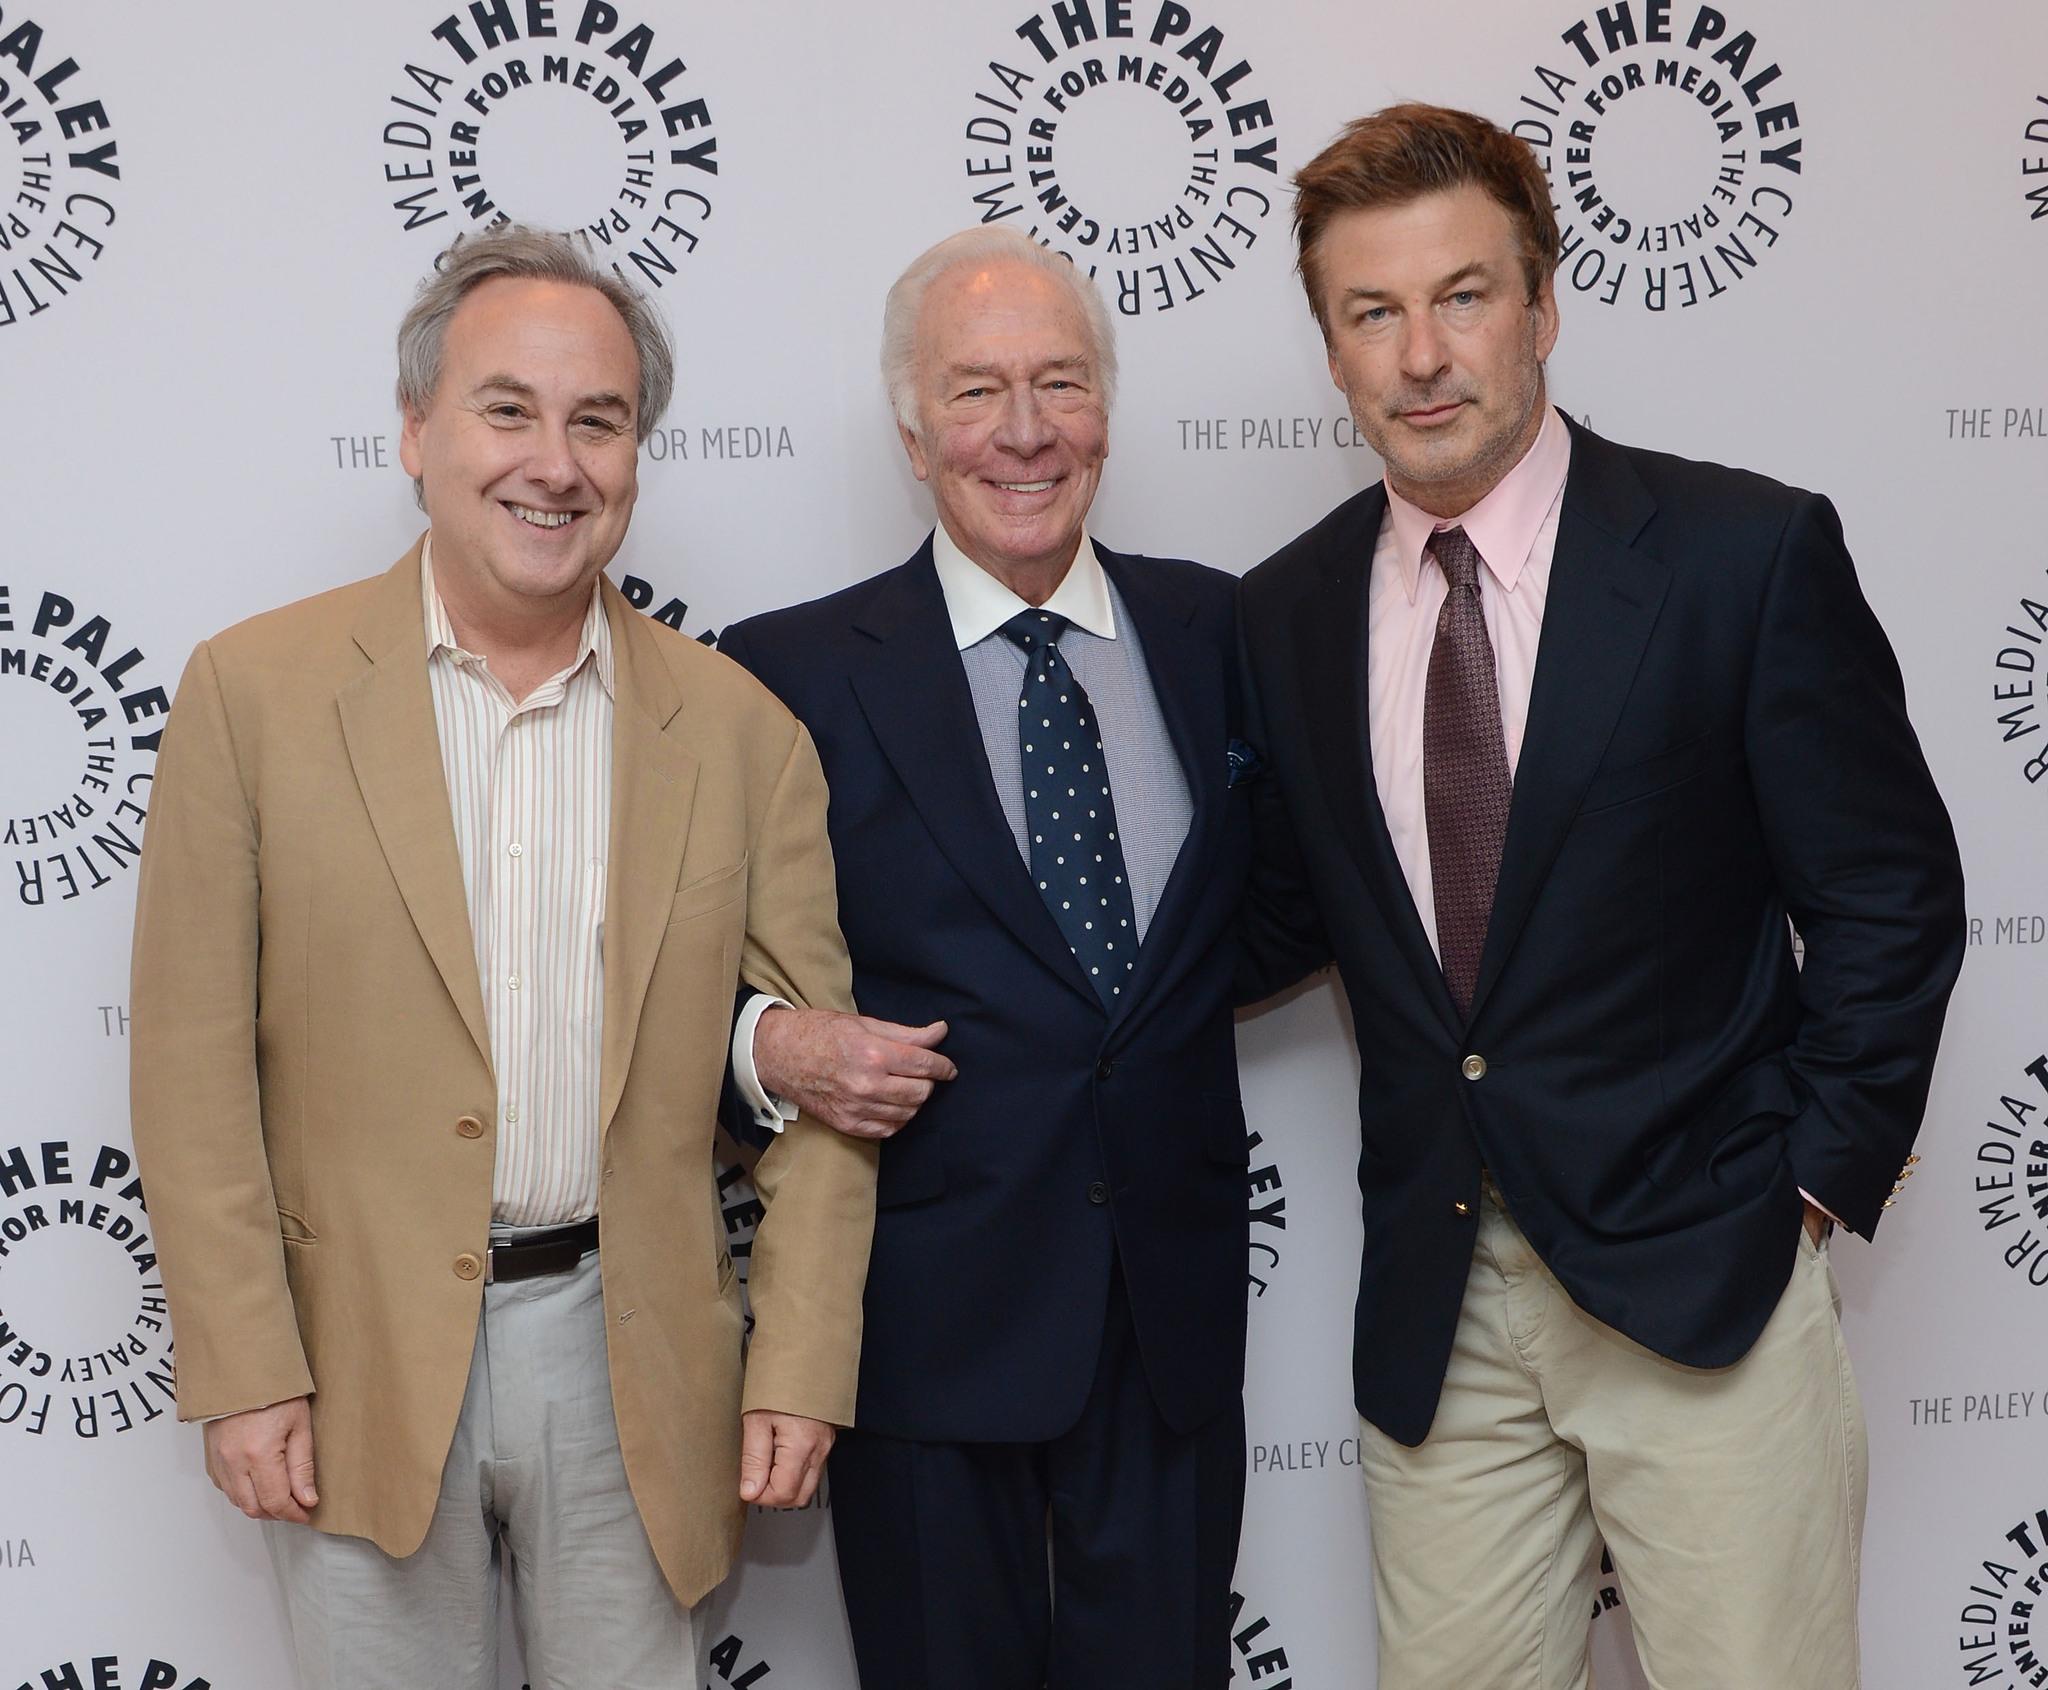 Alec Baldwin, Christopher Plummer and David Edelstein